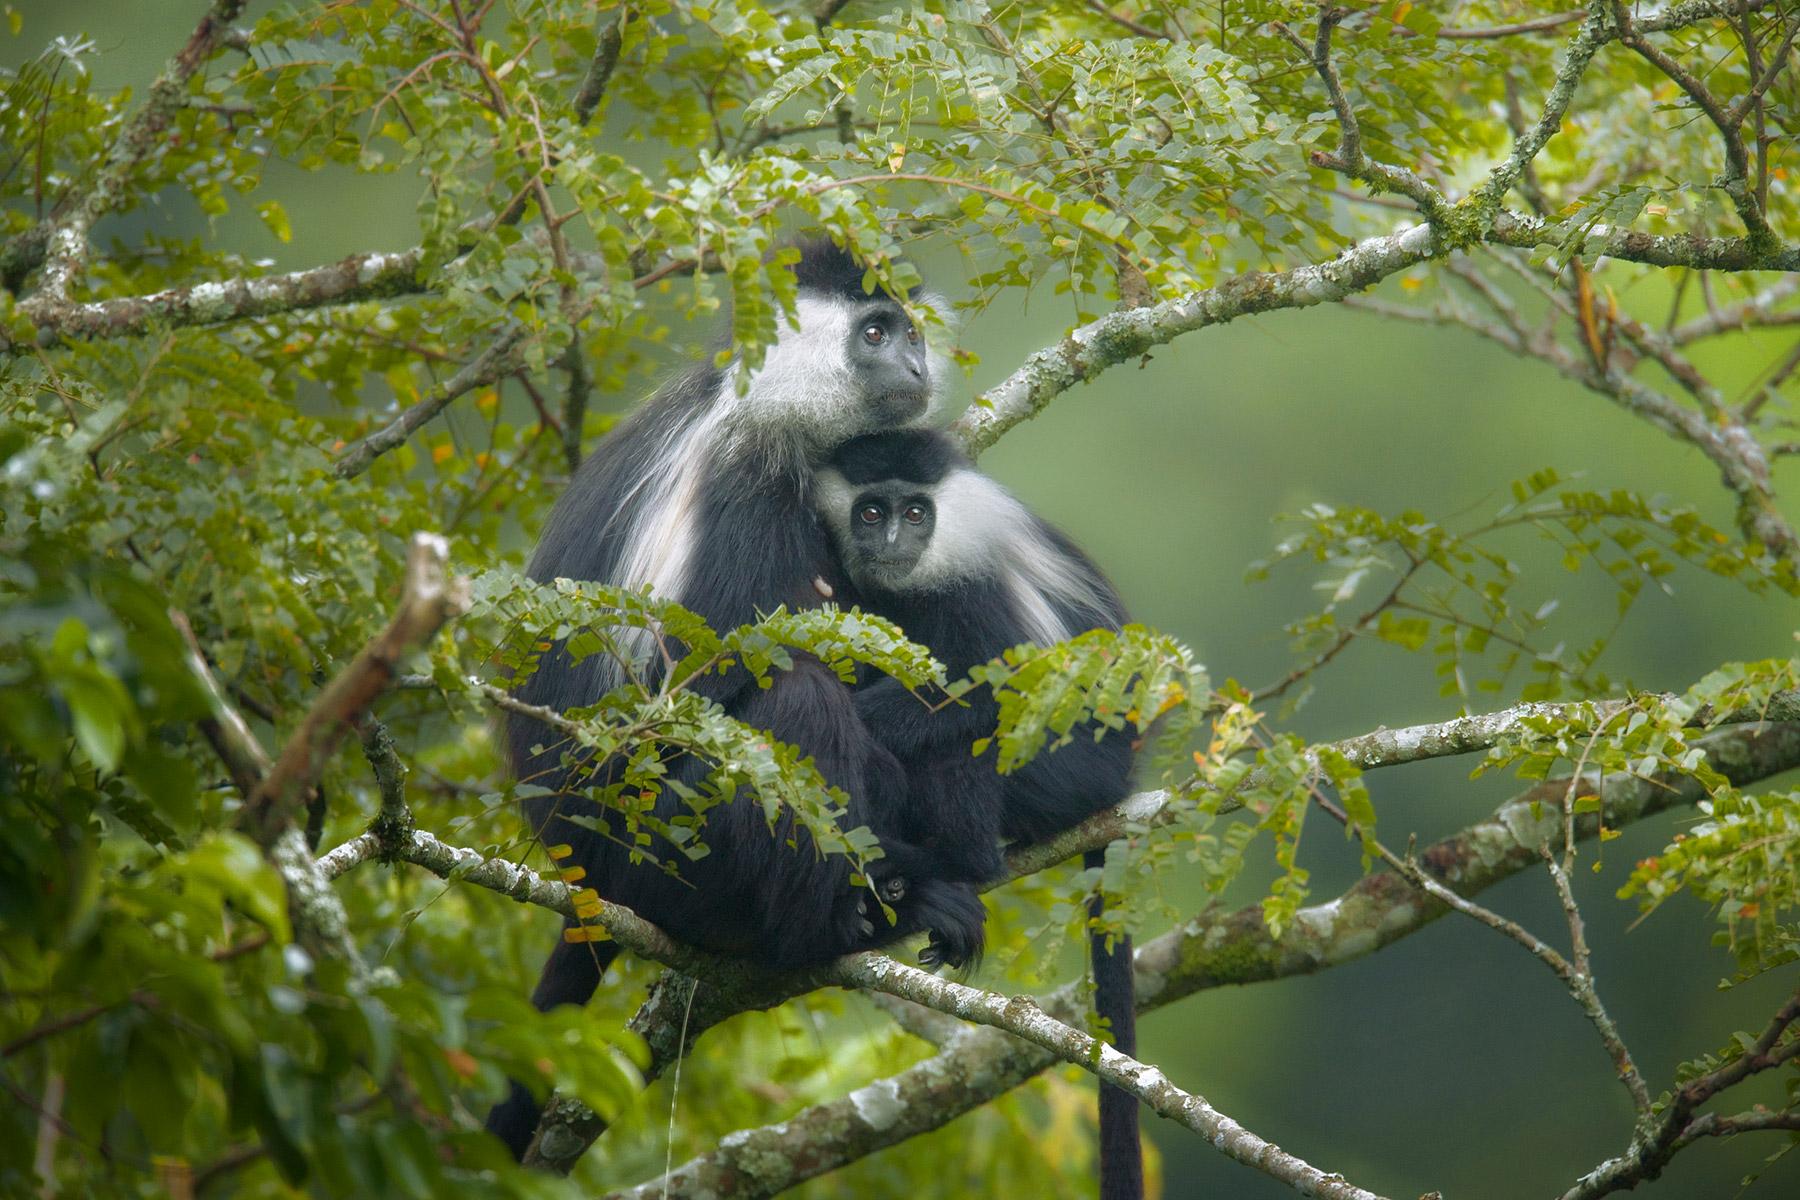 RWANDA_colobus_monkeys_nyungwe_forest